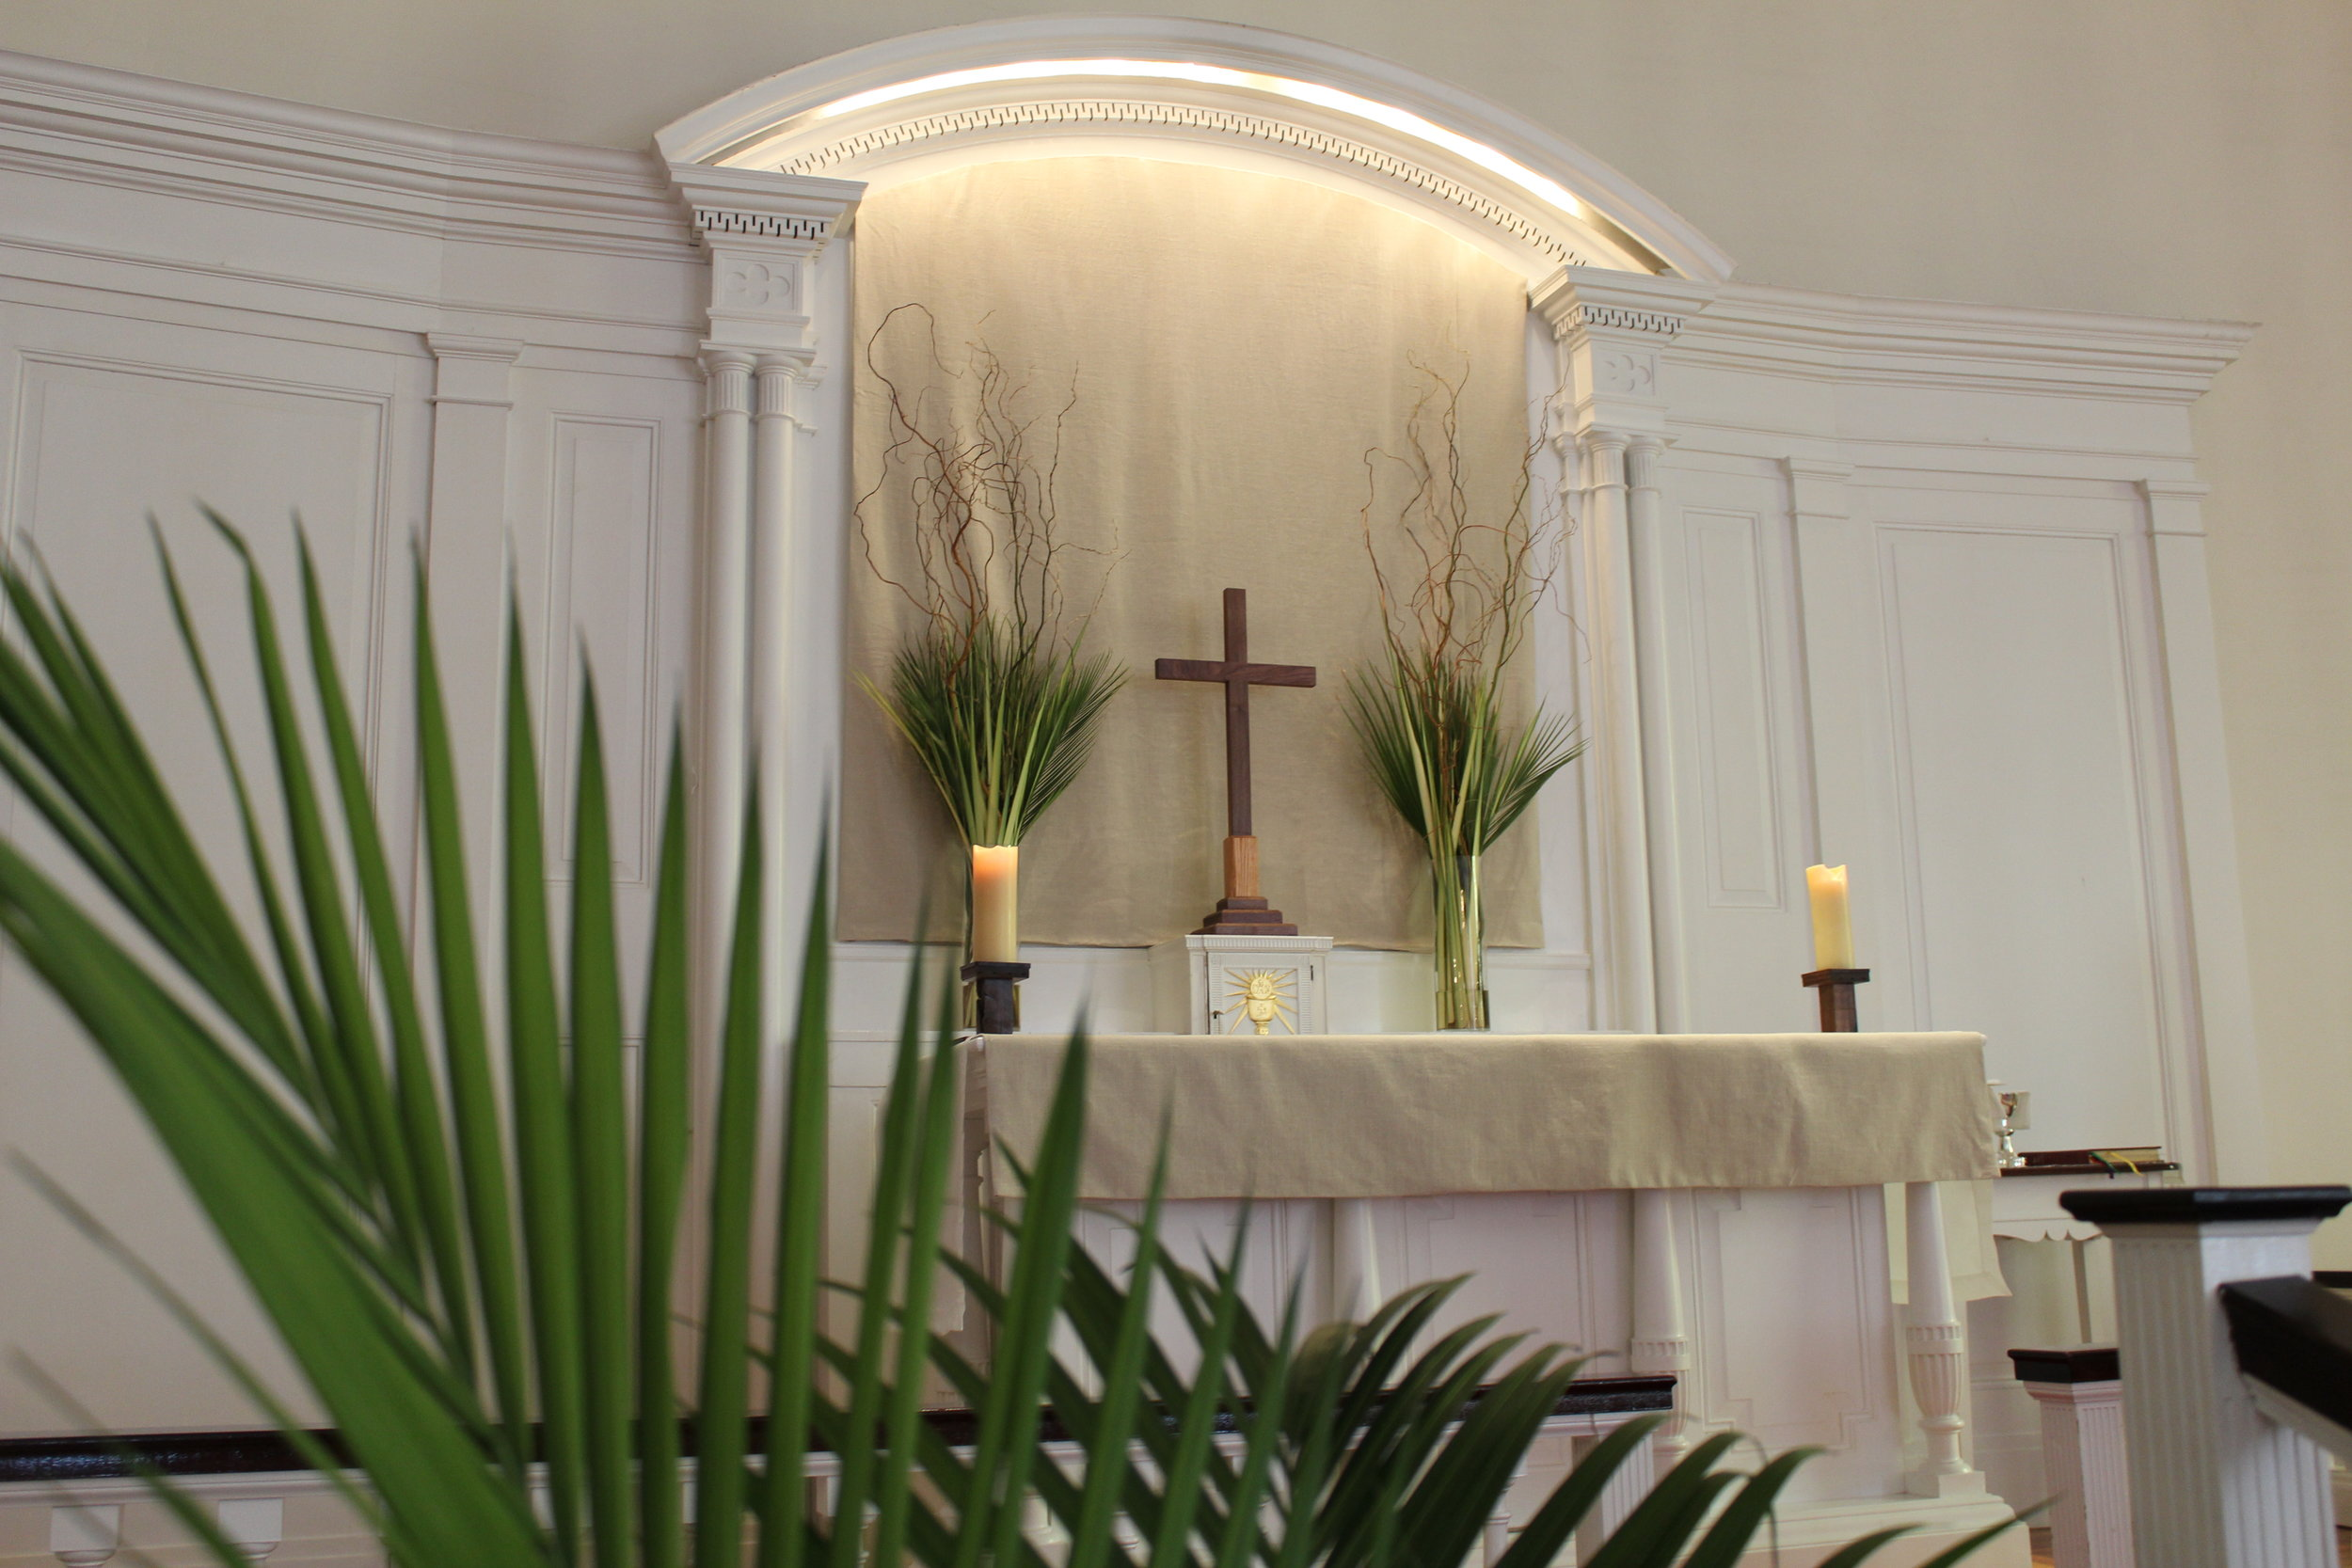 Copy of Lenten Array with Palms